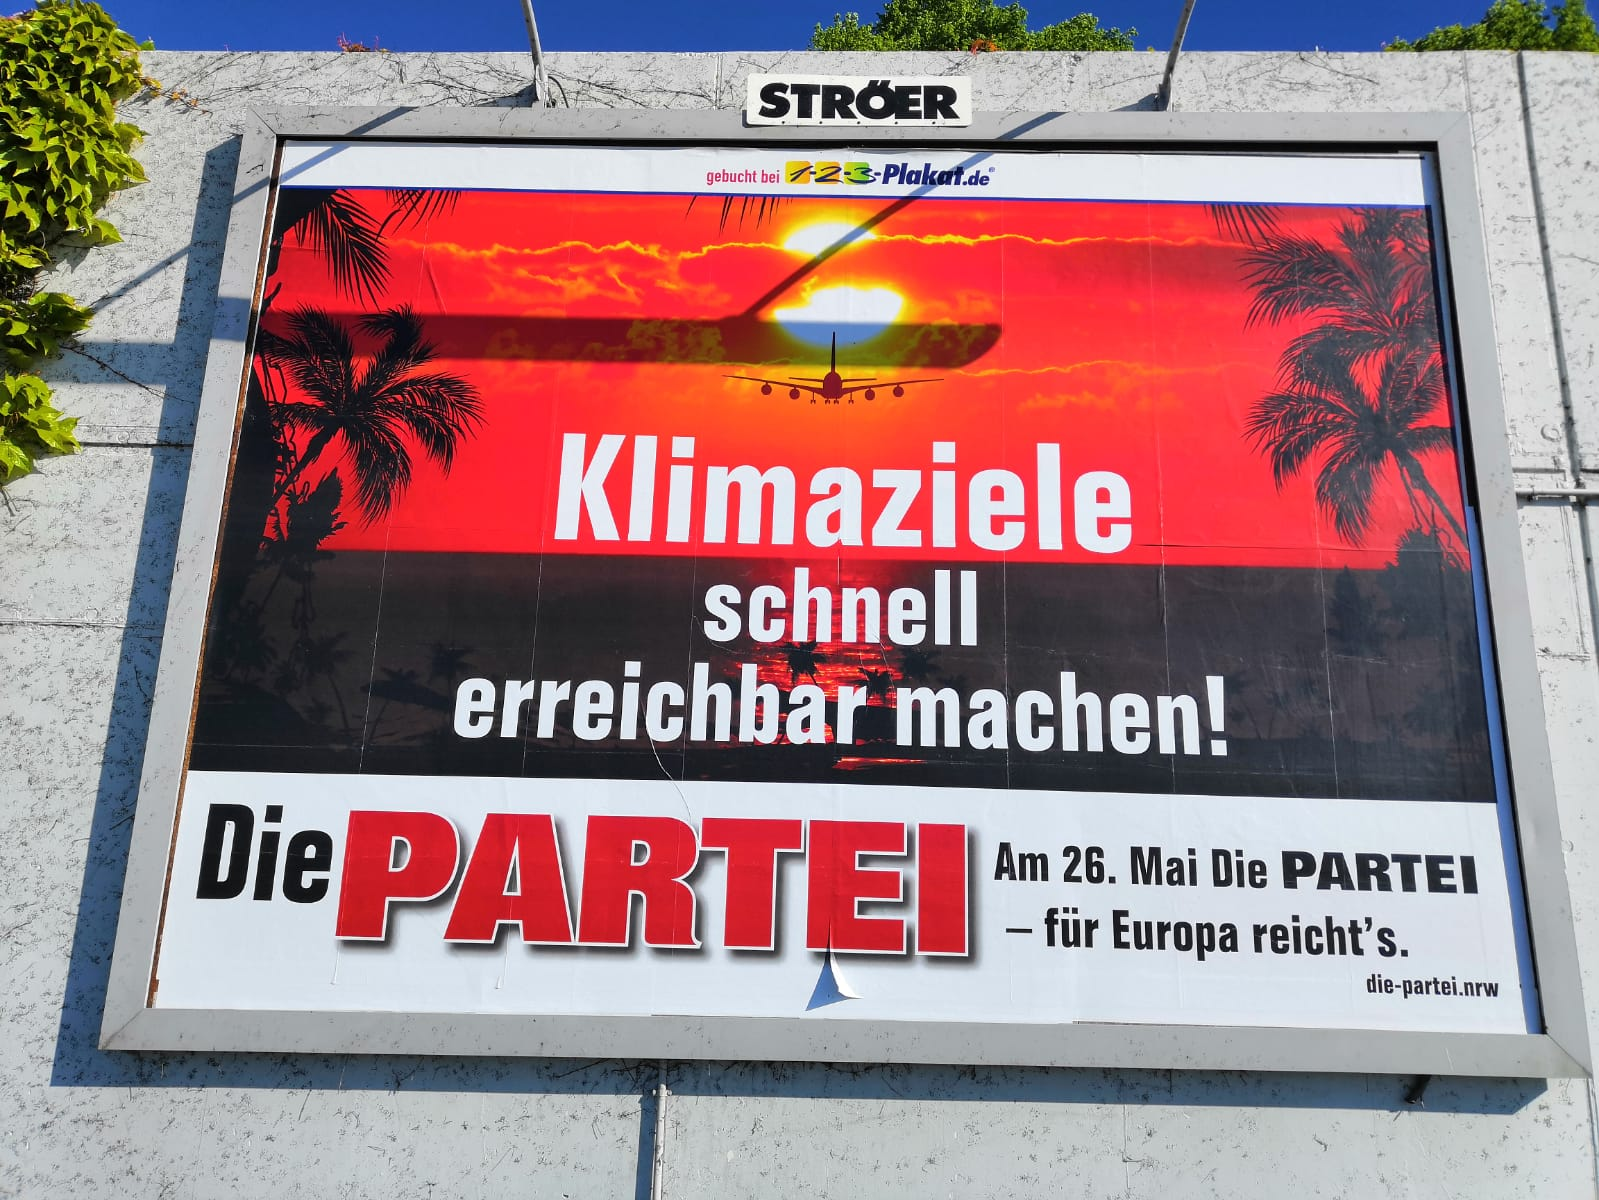 Großplakat am Dortmunder Flughafen